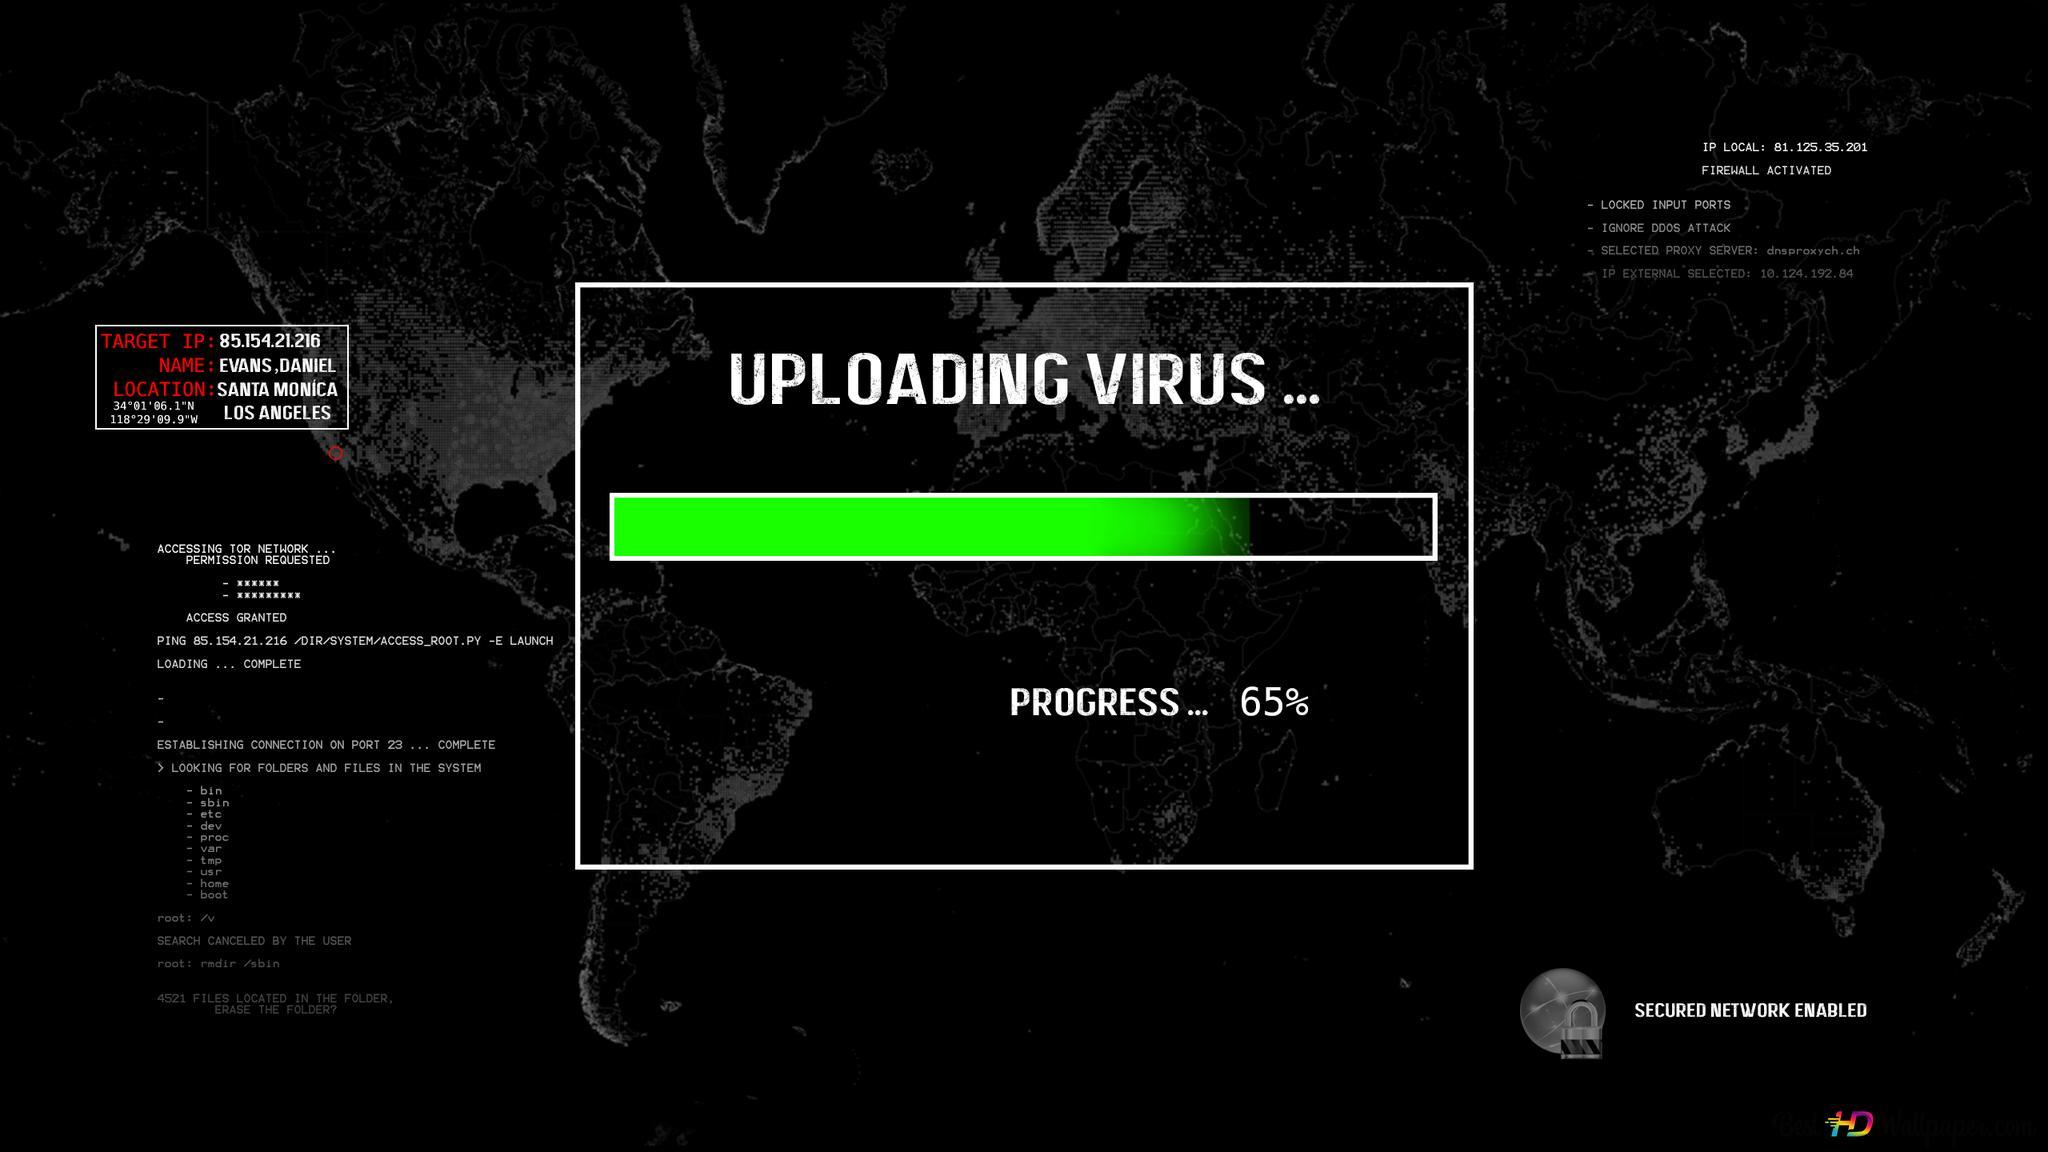 Virus Fond Noir Hd Fond Décran Télécharger